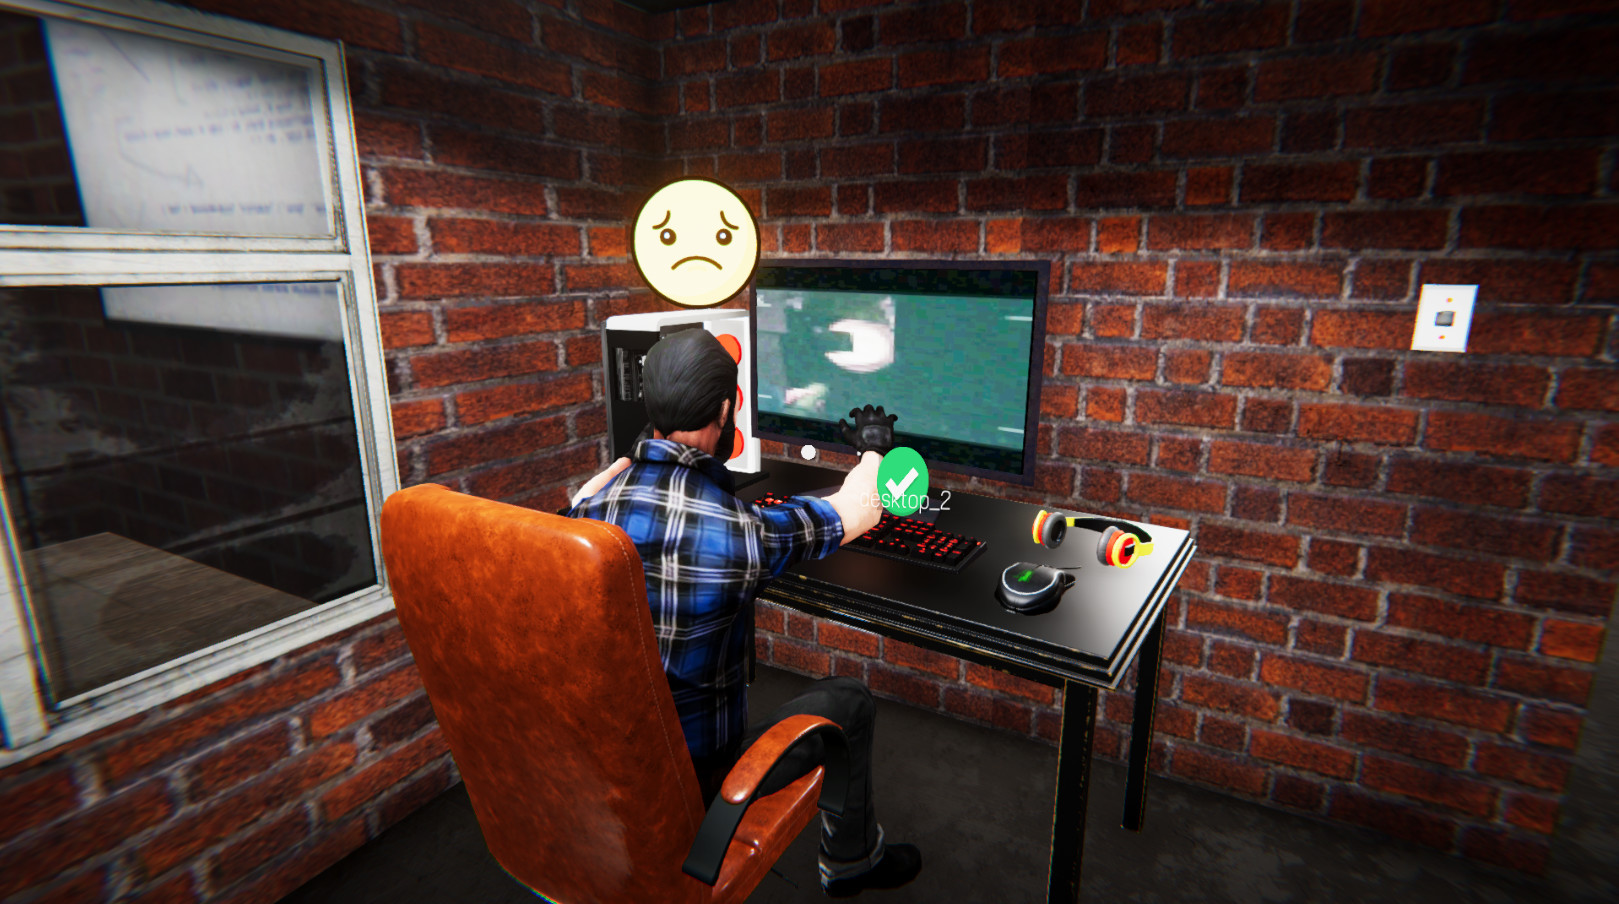 网吧模拟器/网咖模拟器/Internet Cafe Simulator插图1